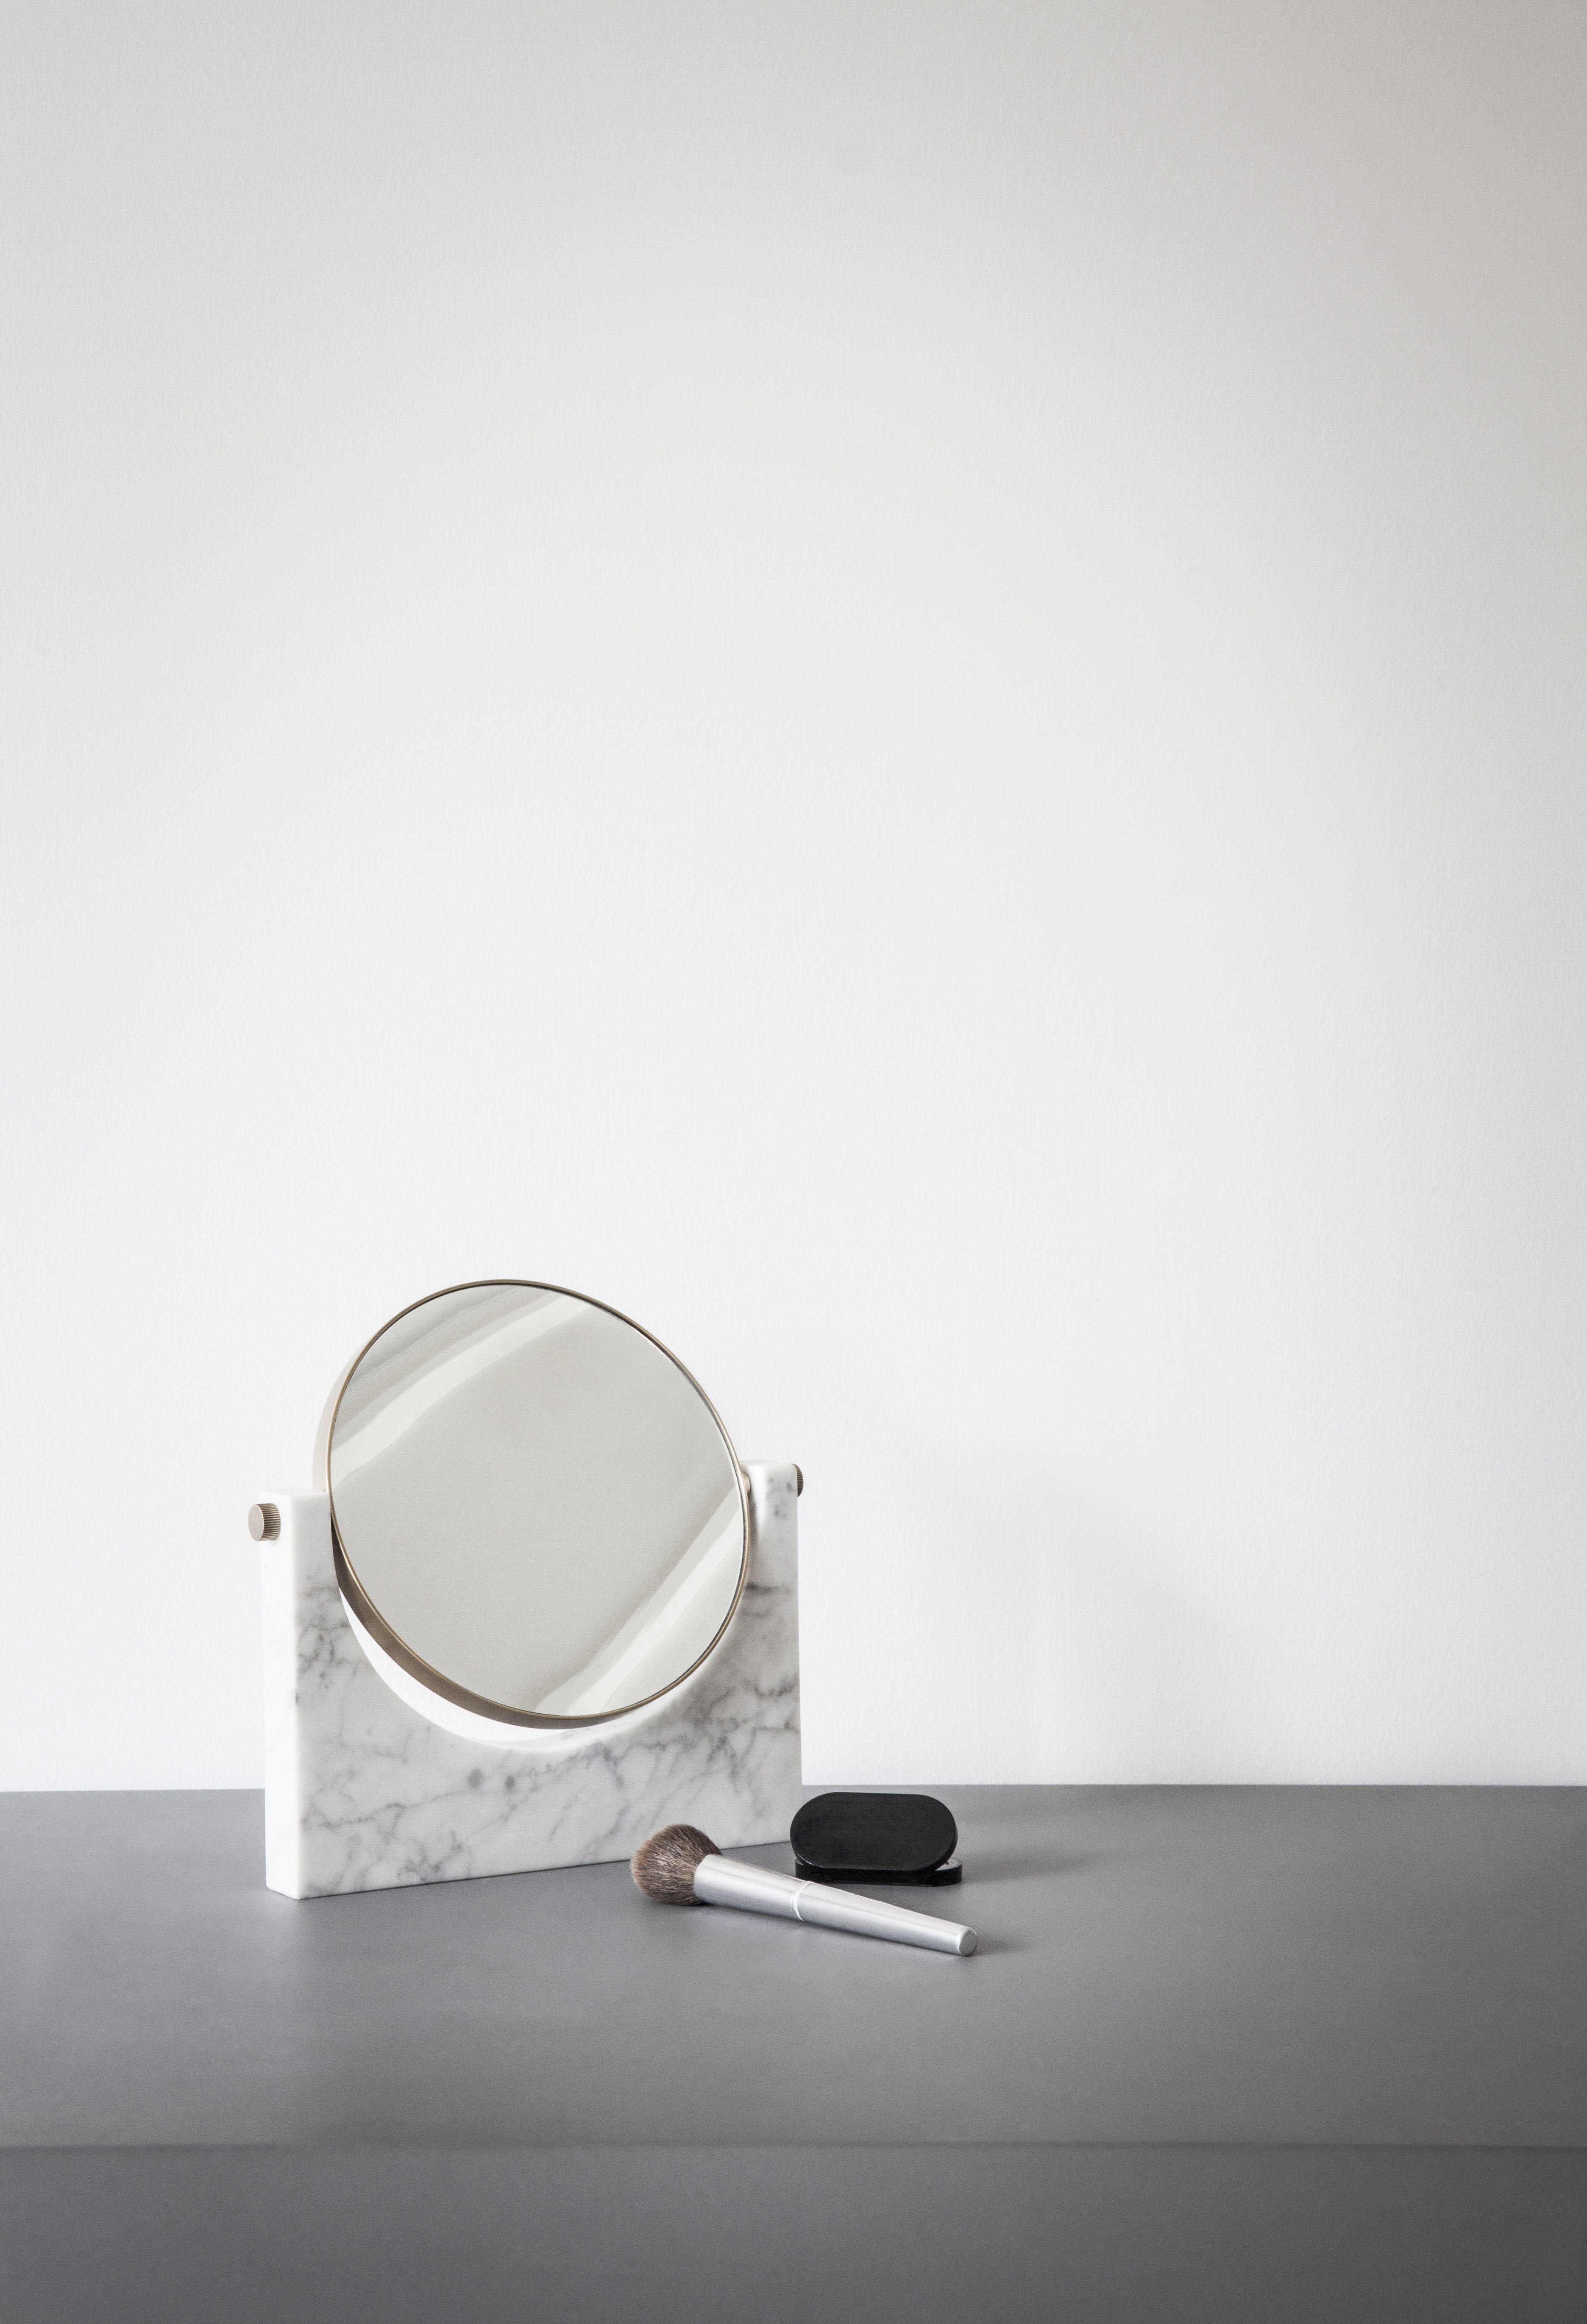 miroir pepe marble marbre laiton h 26 cm marbre blanc laiton menu. Black Bedroom Furniture Sets. Home Design Ideas